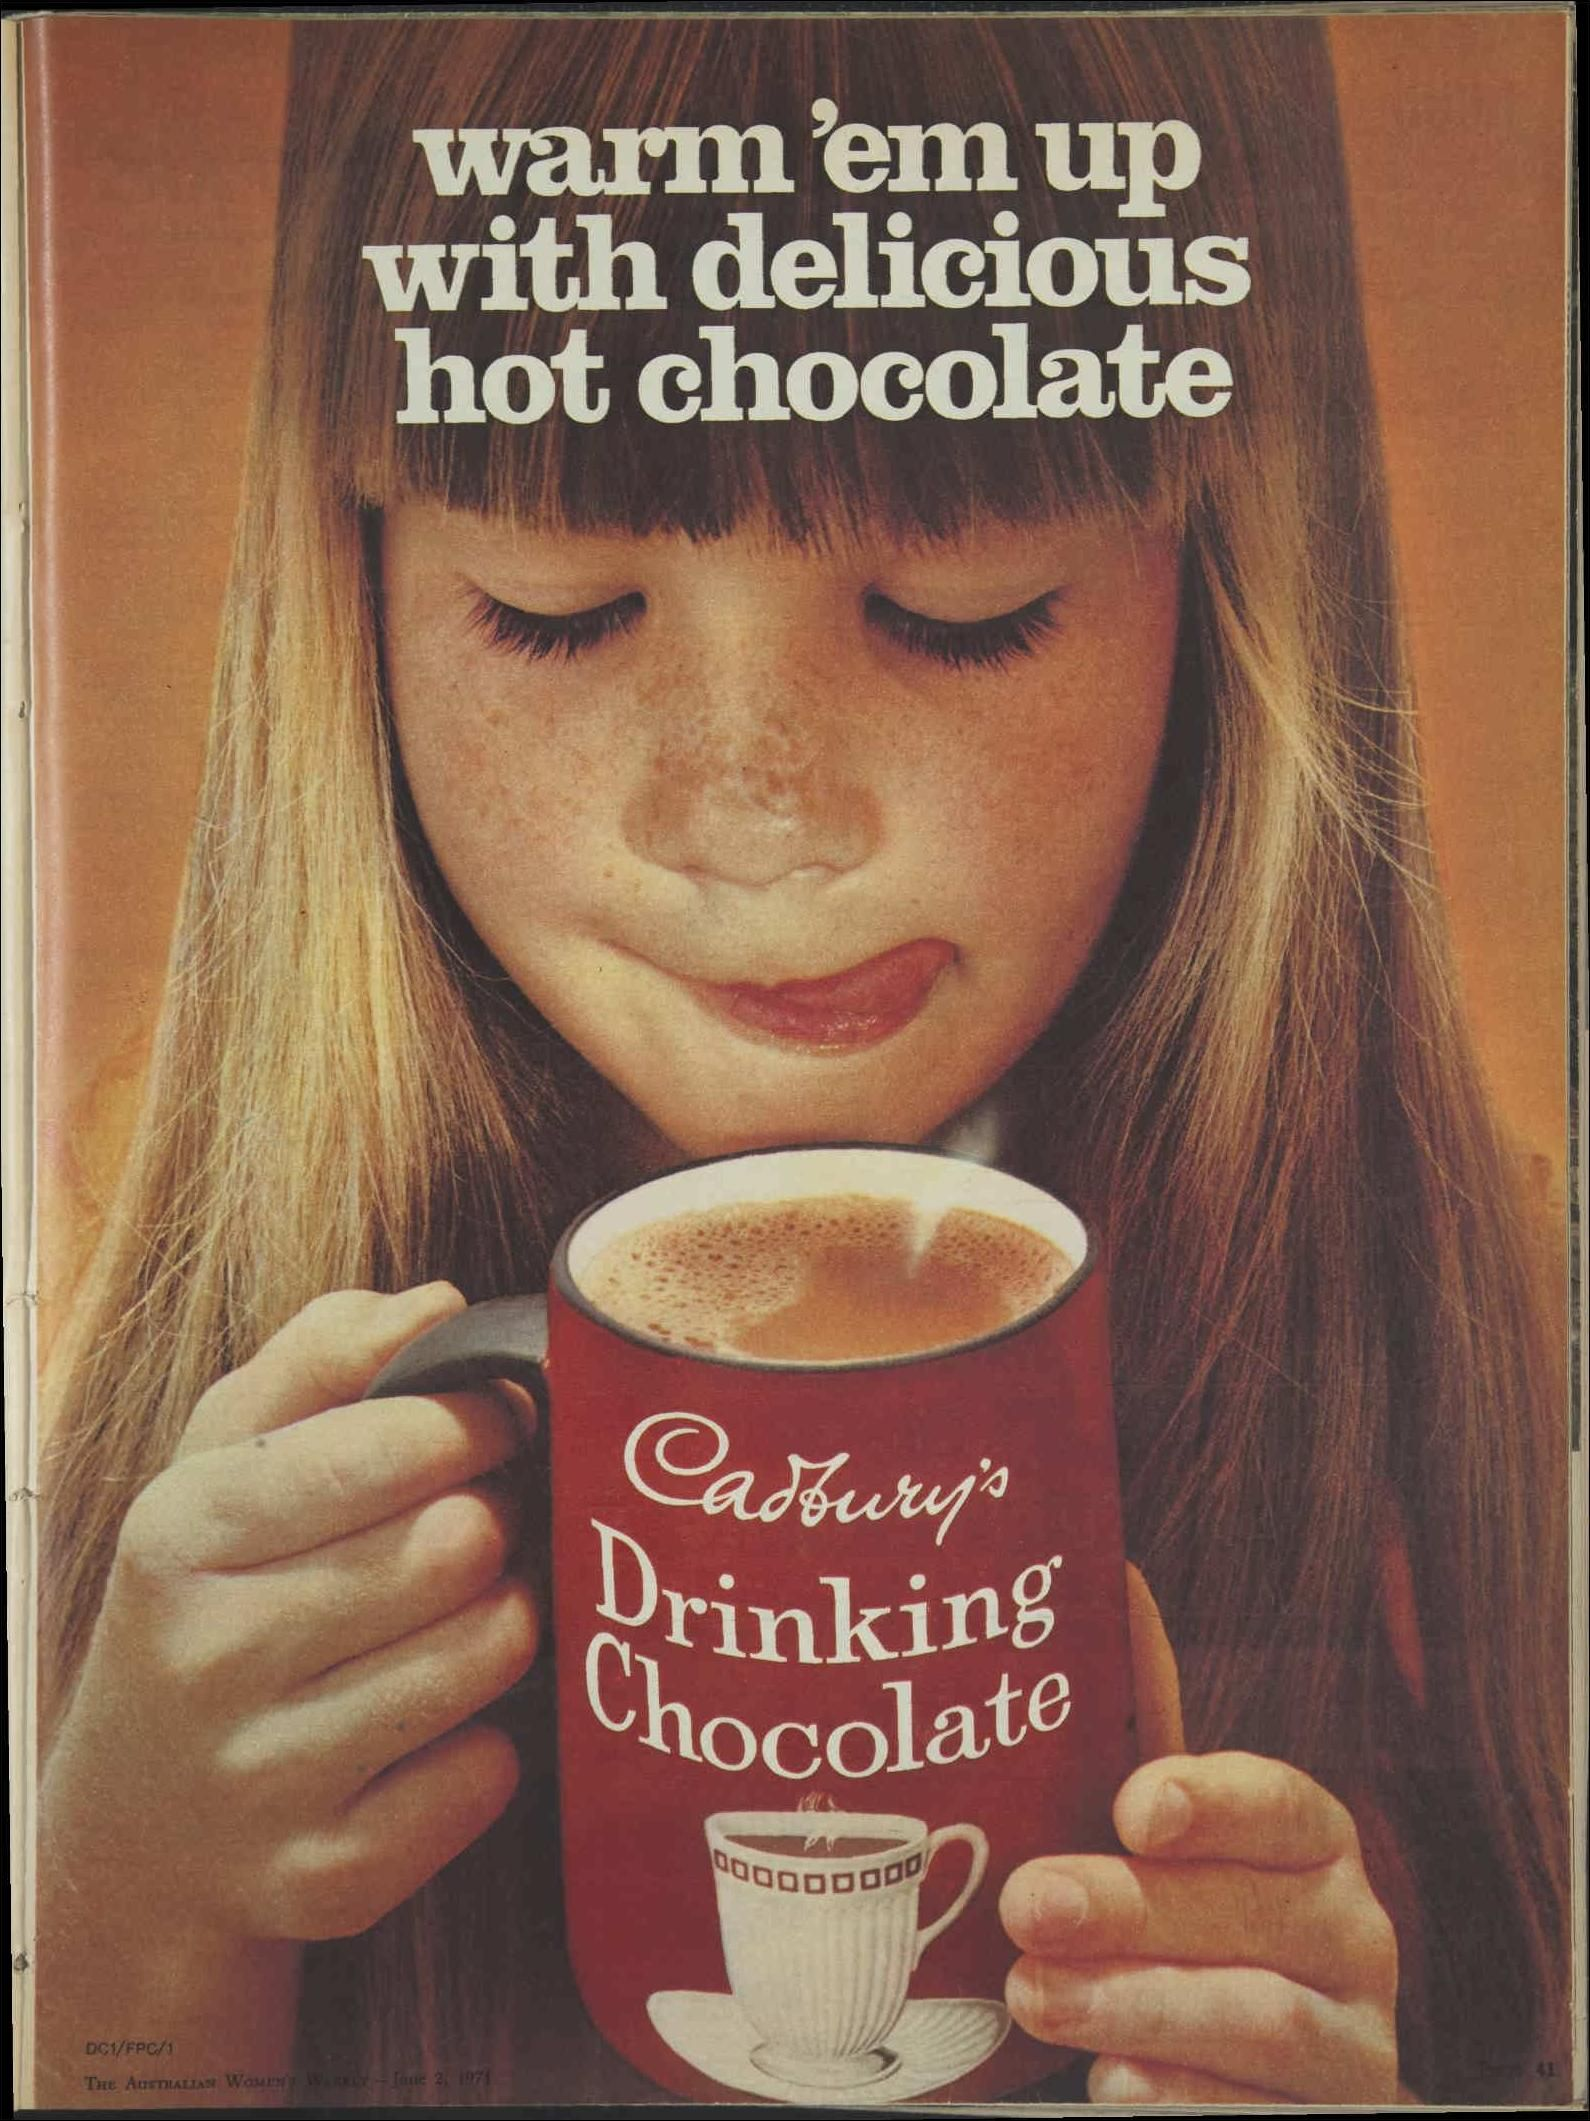 Issue 2 Jun 1971 The Australian Women S Week Hot Chocolate Cadbury Delicious Hot Chocolate Cadbury Drinking Chocolate